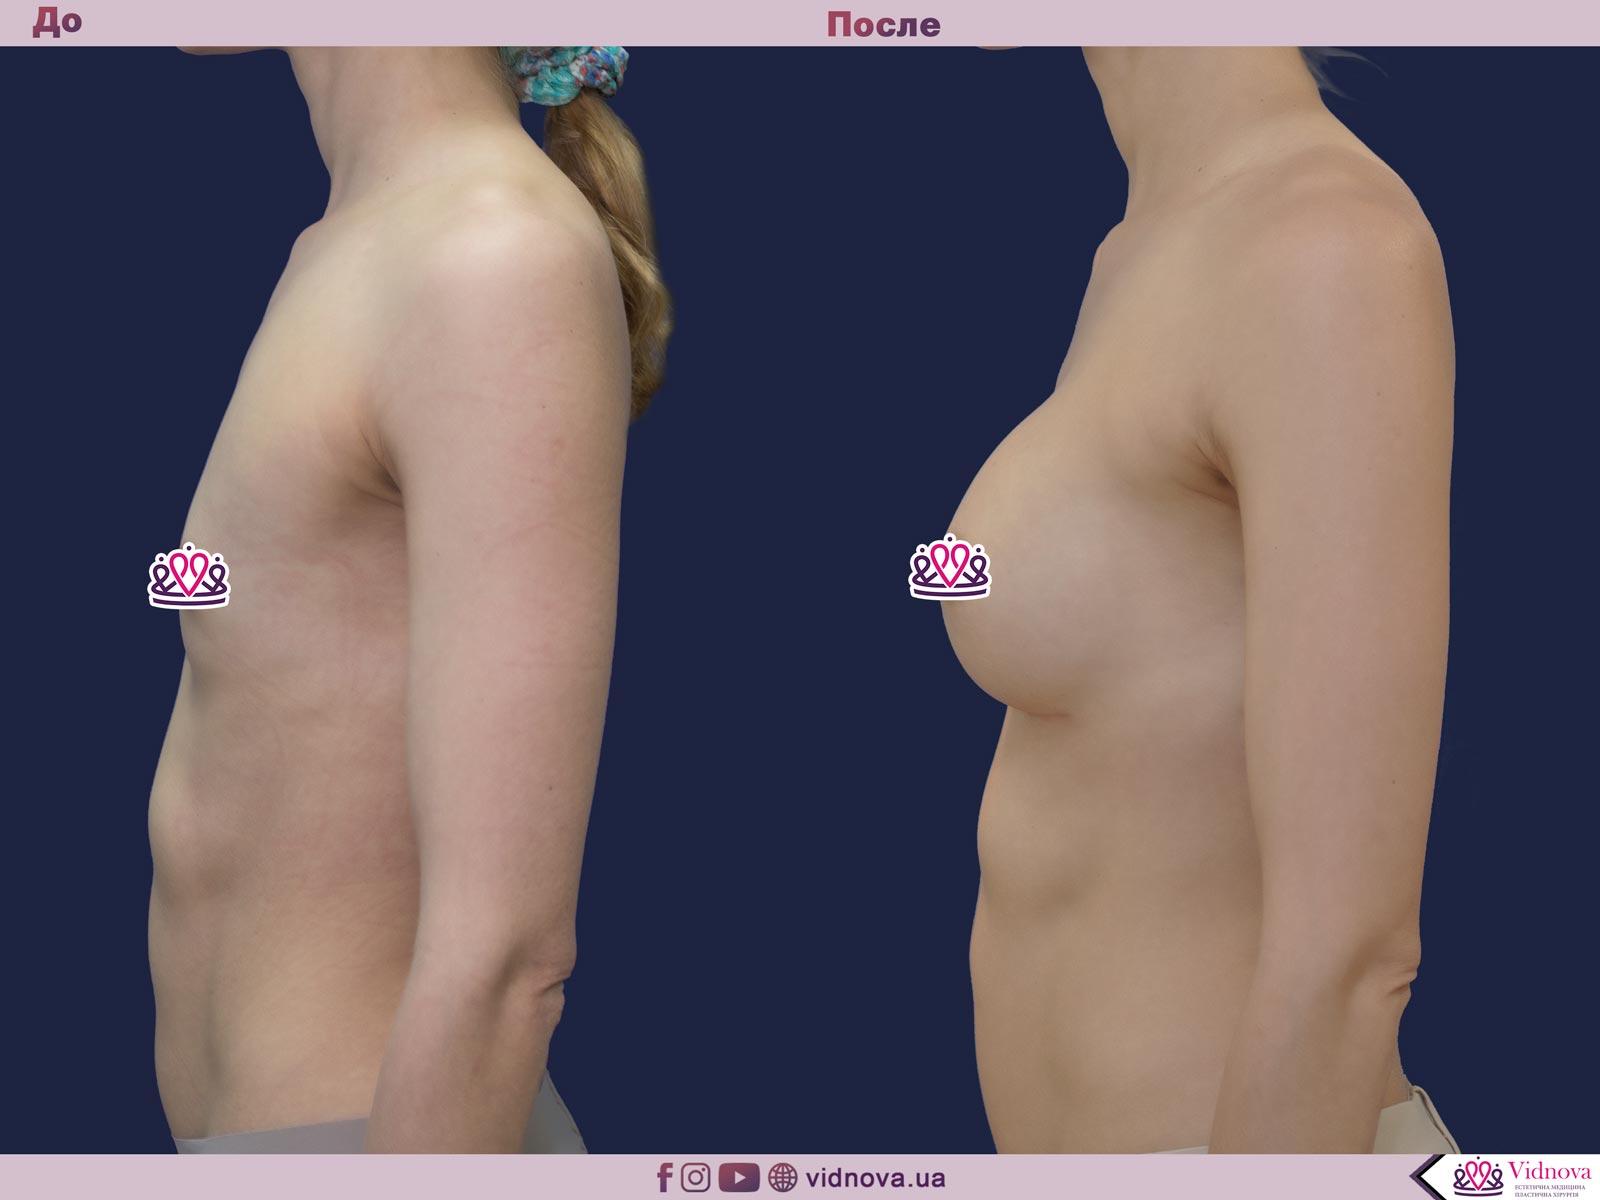 Увеличение груди: Фото ДО и ПОСЛЕ - Пример №58-3 - Клиника Vidnova